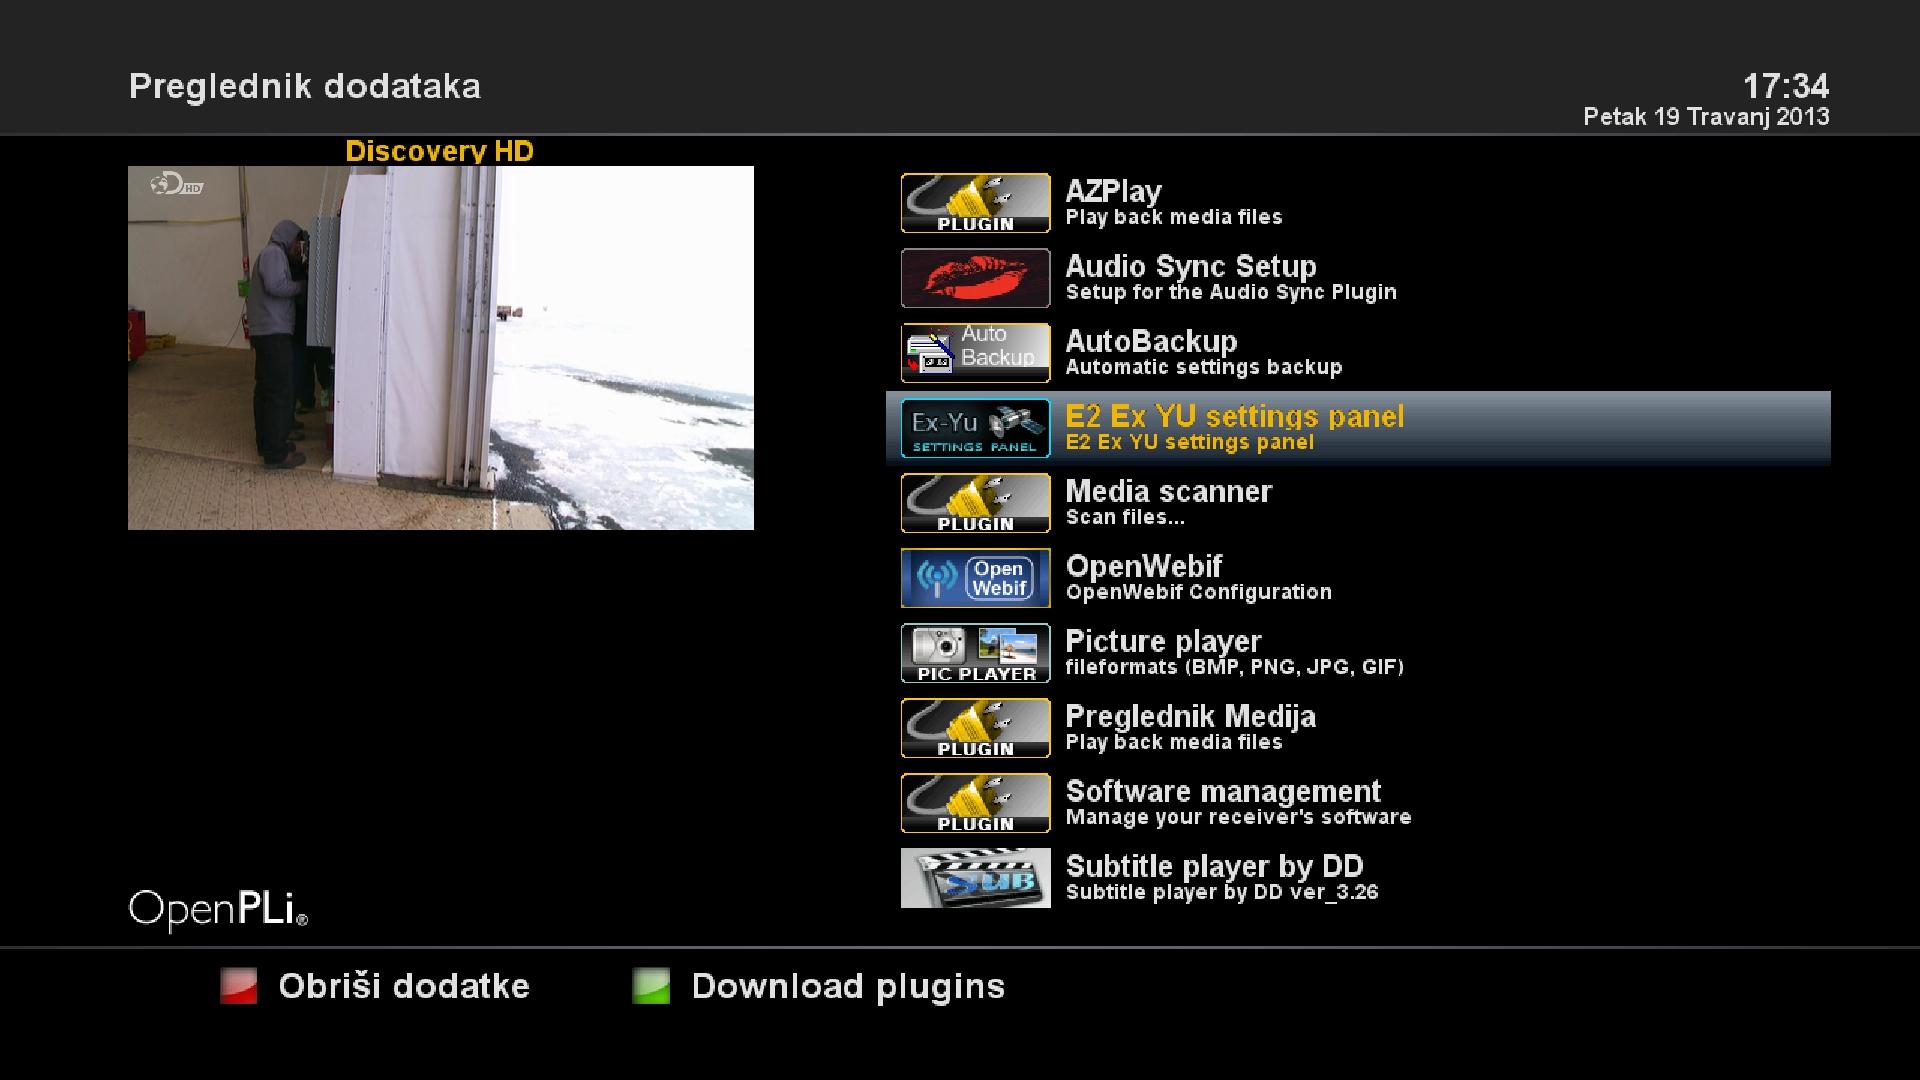 Ex YU settings panel E2 beta4 fix 19-4-2013